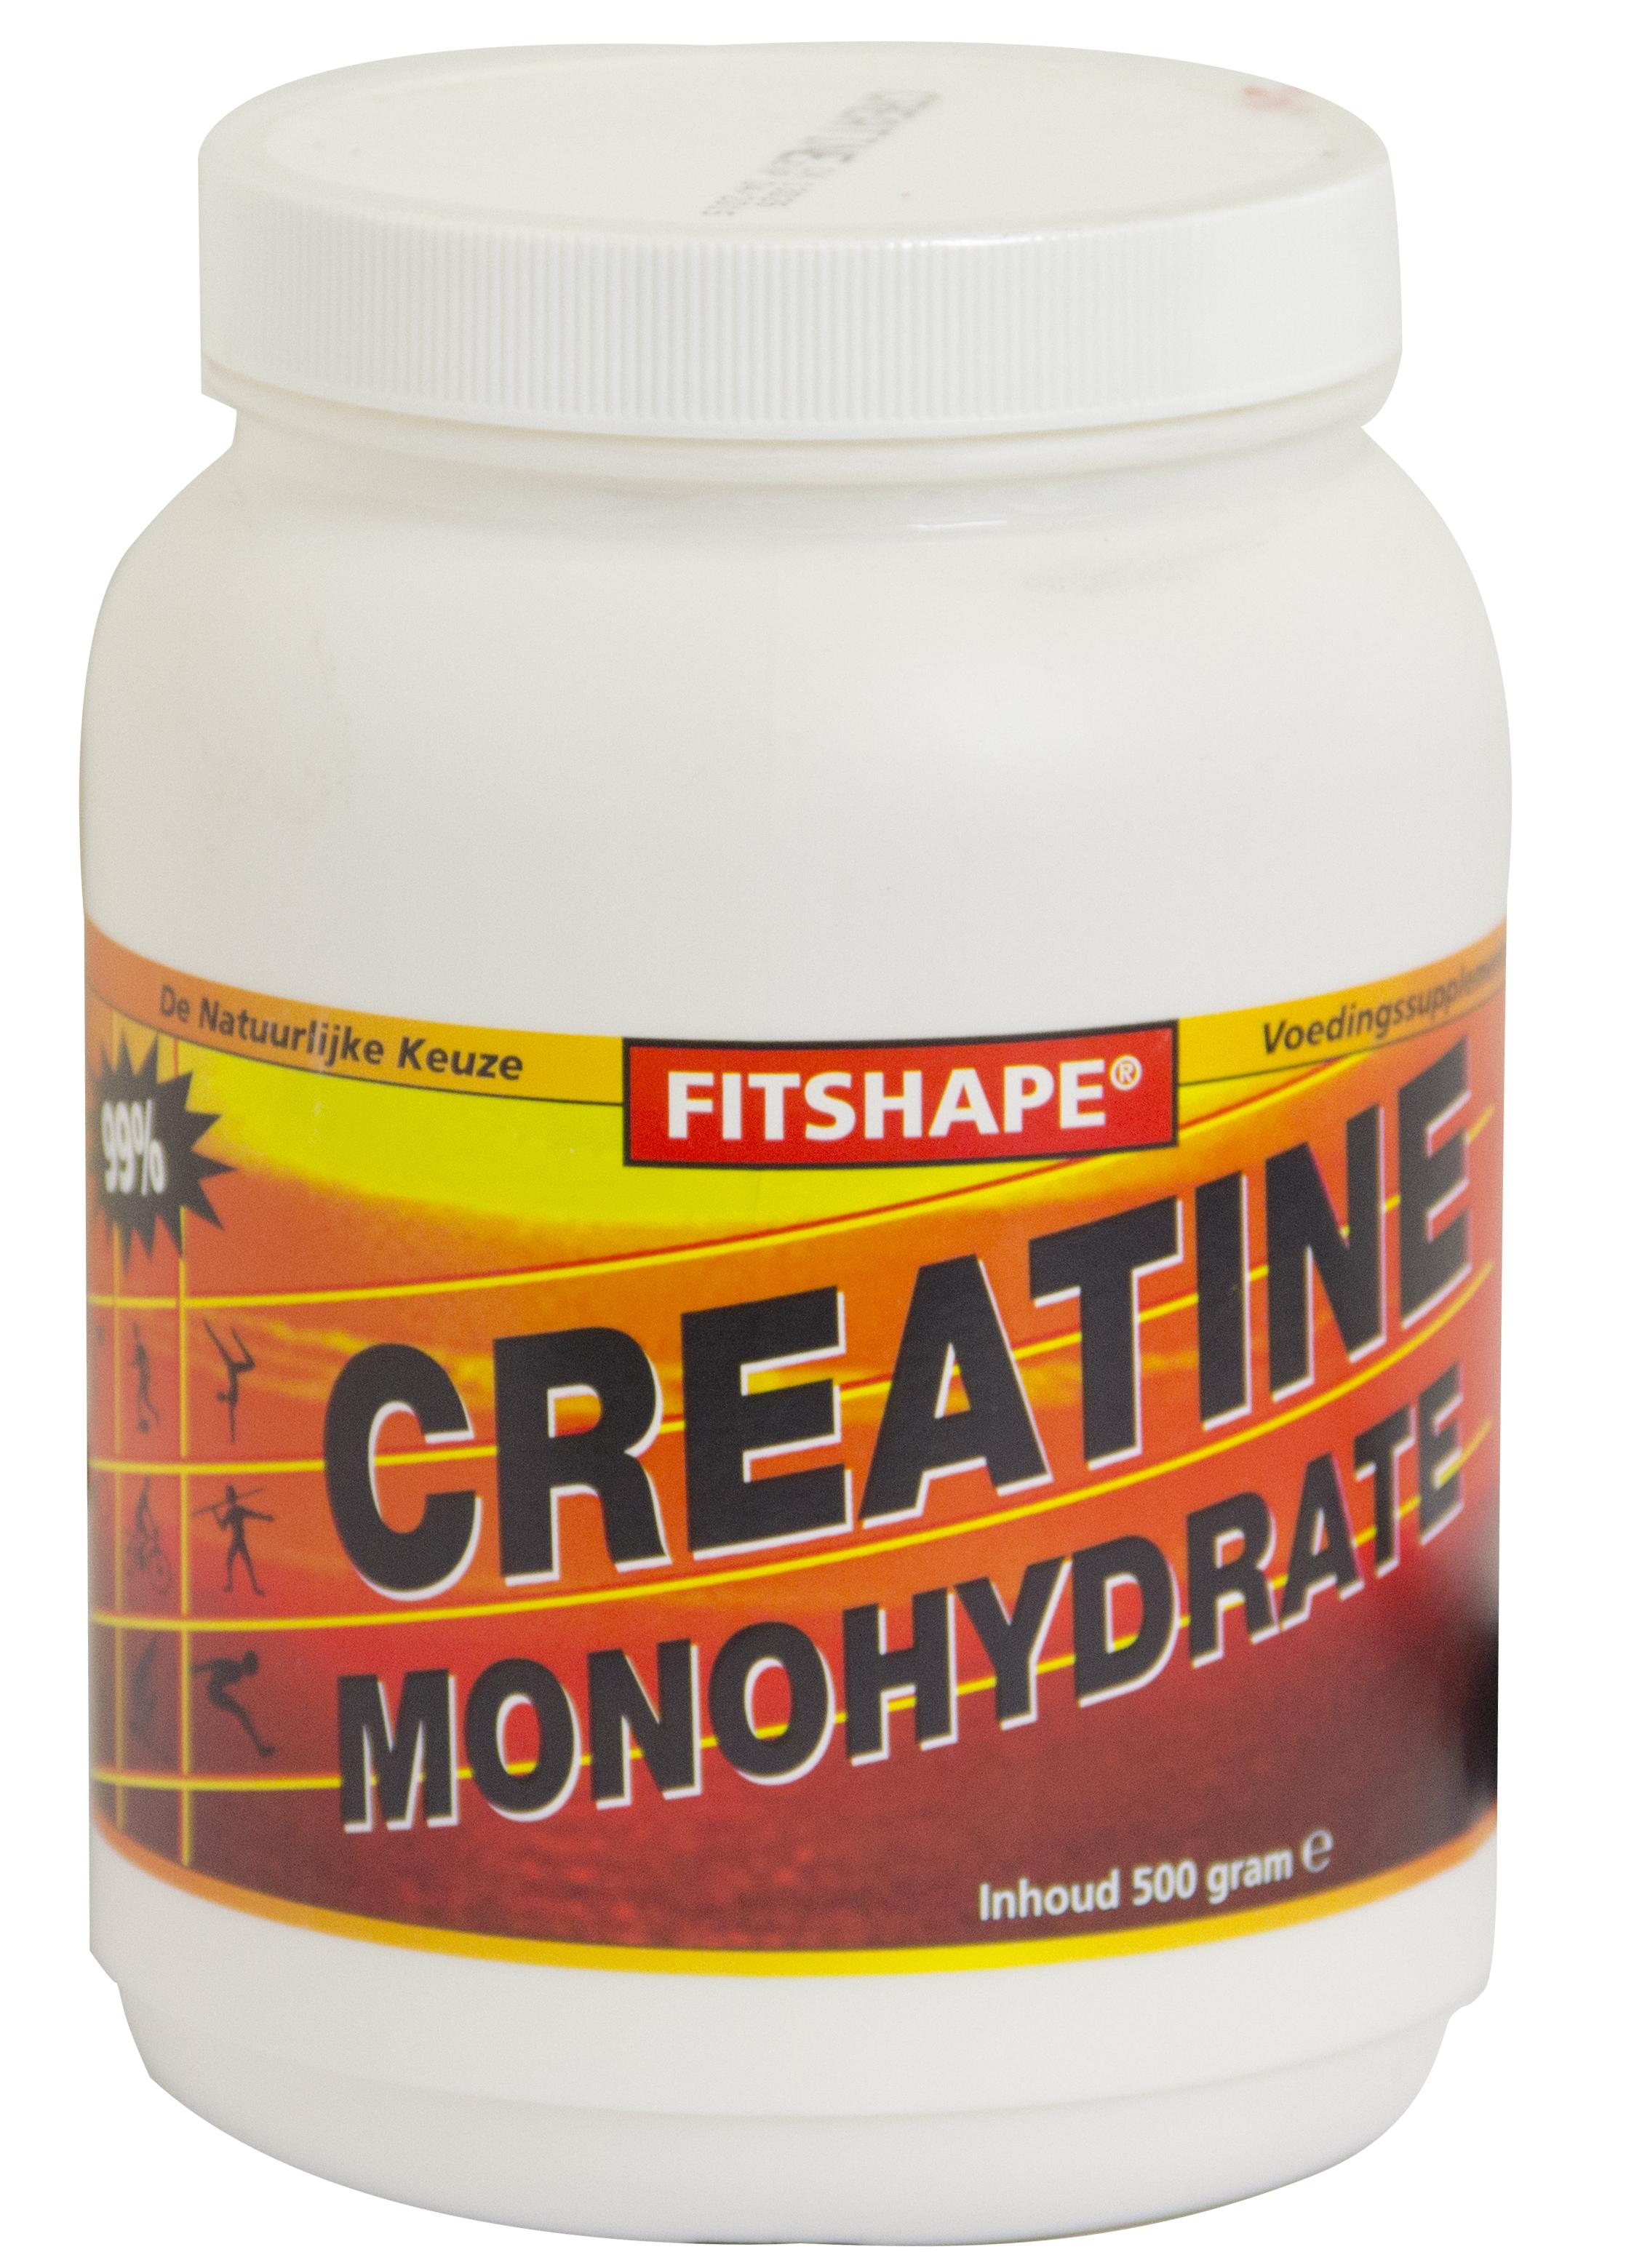 Fitshape Creatine Monohydrate (125 gram)